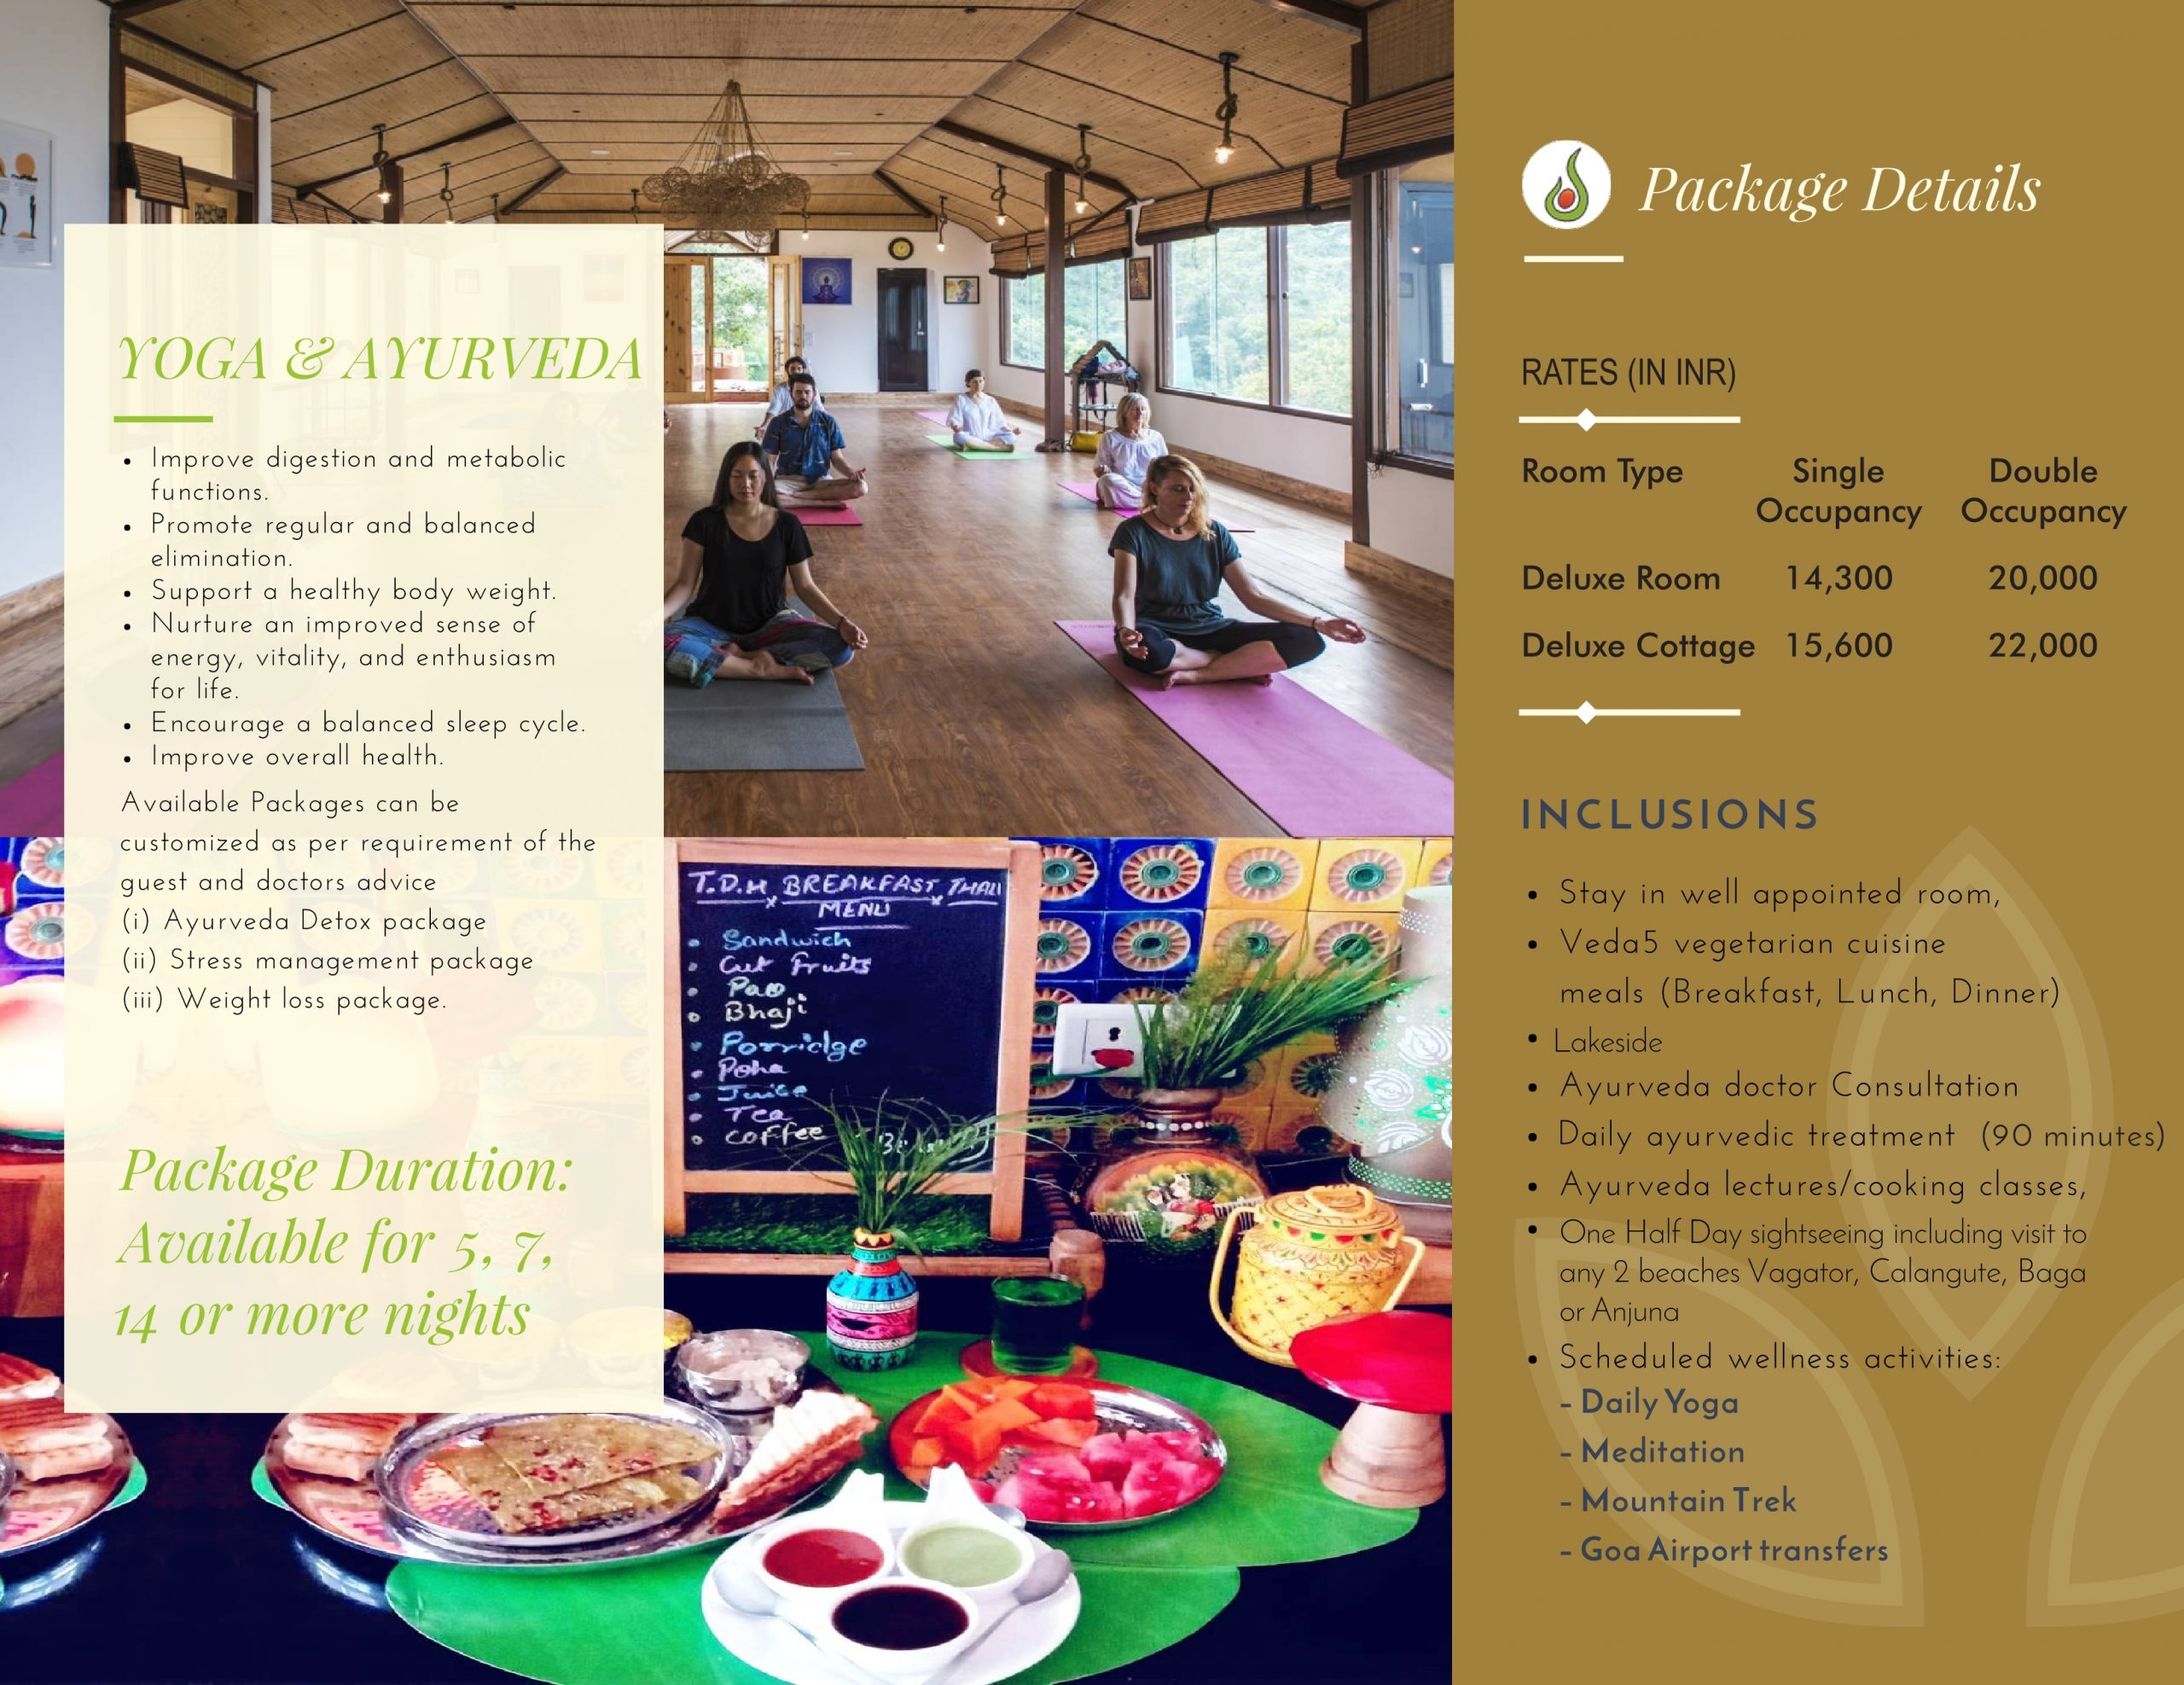 Veda5 Wellness Retreat and Spa in Arambol Goa India for Yoga and Ayurveda Panchakarma Treatments and Hotel Resort for Vacation - 1